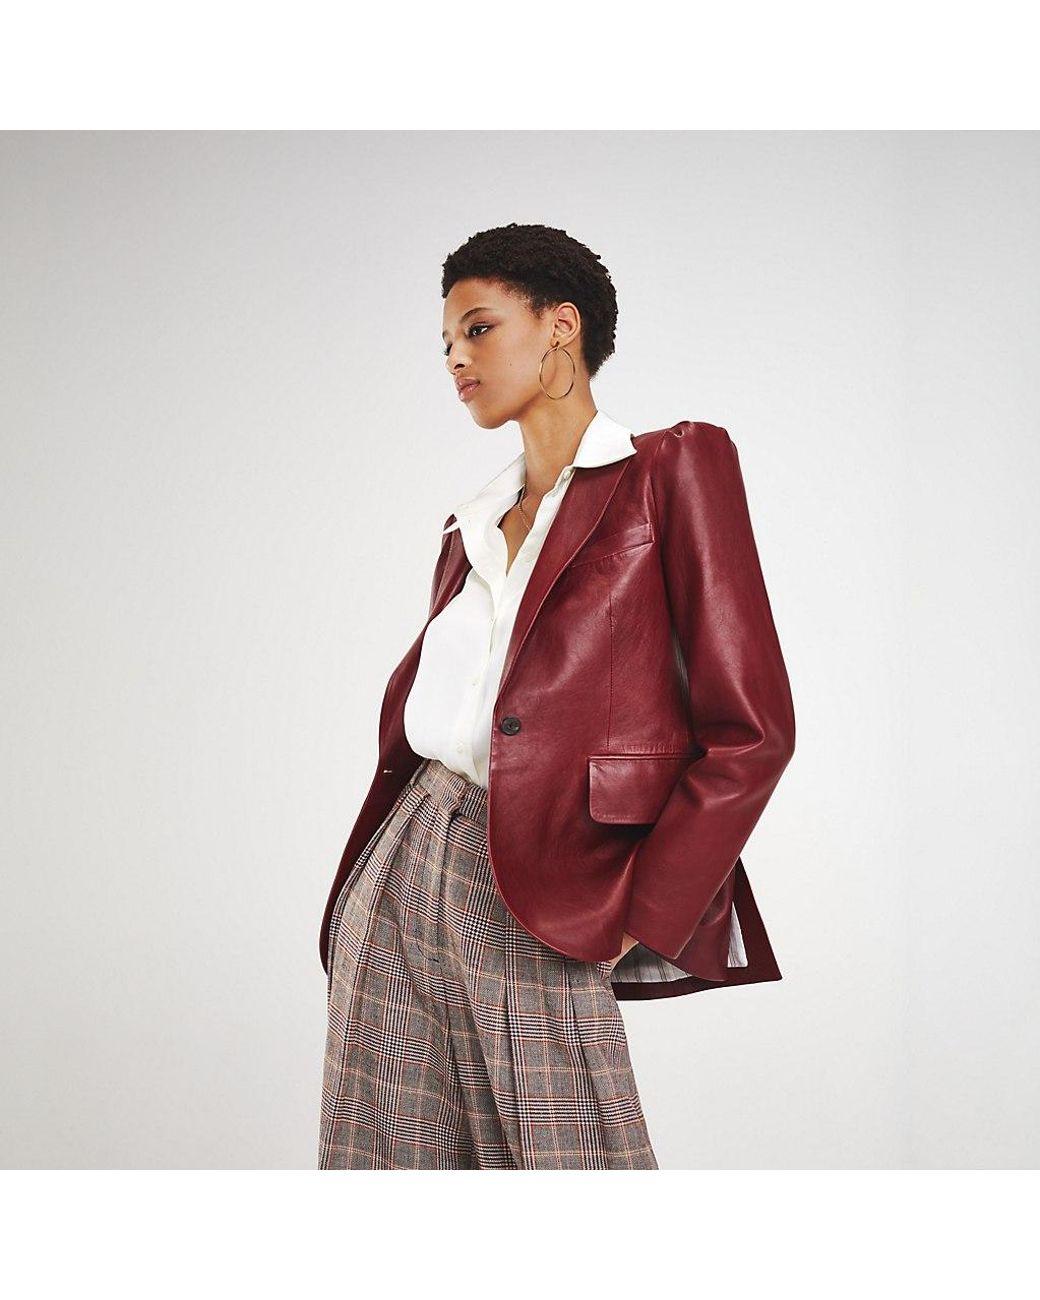 42678e9d Tommy Hilfiger Zendaya Leather Blazer in Brown - Lyst